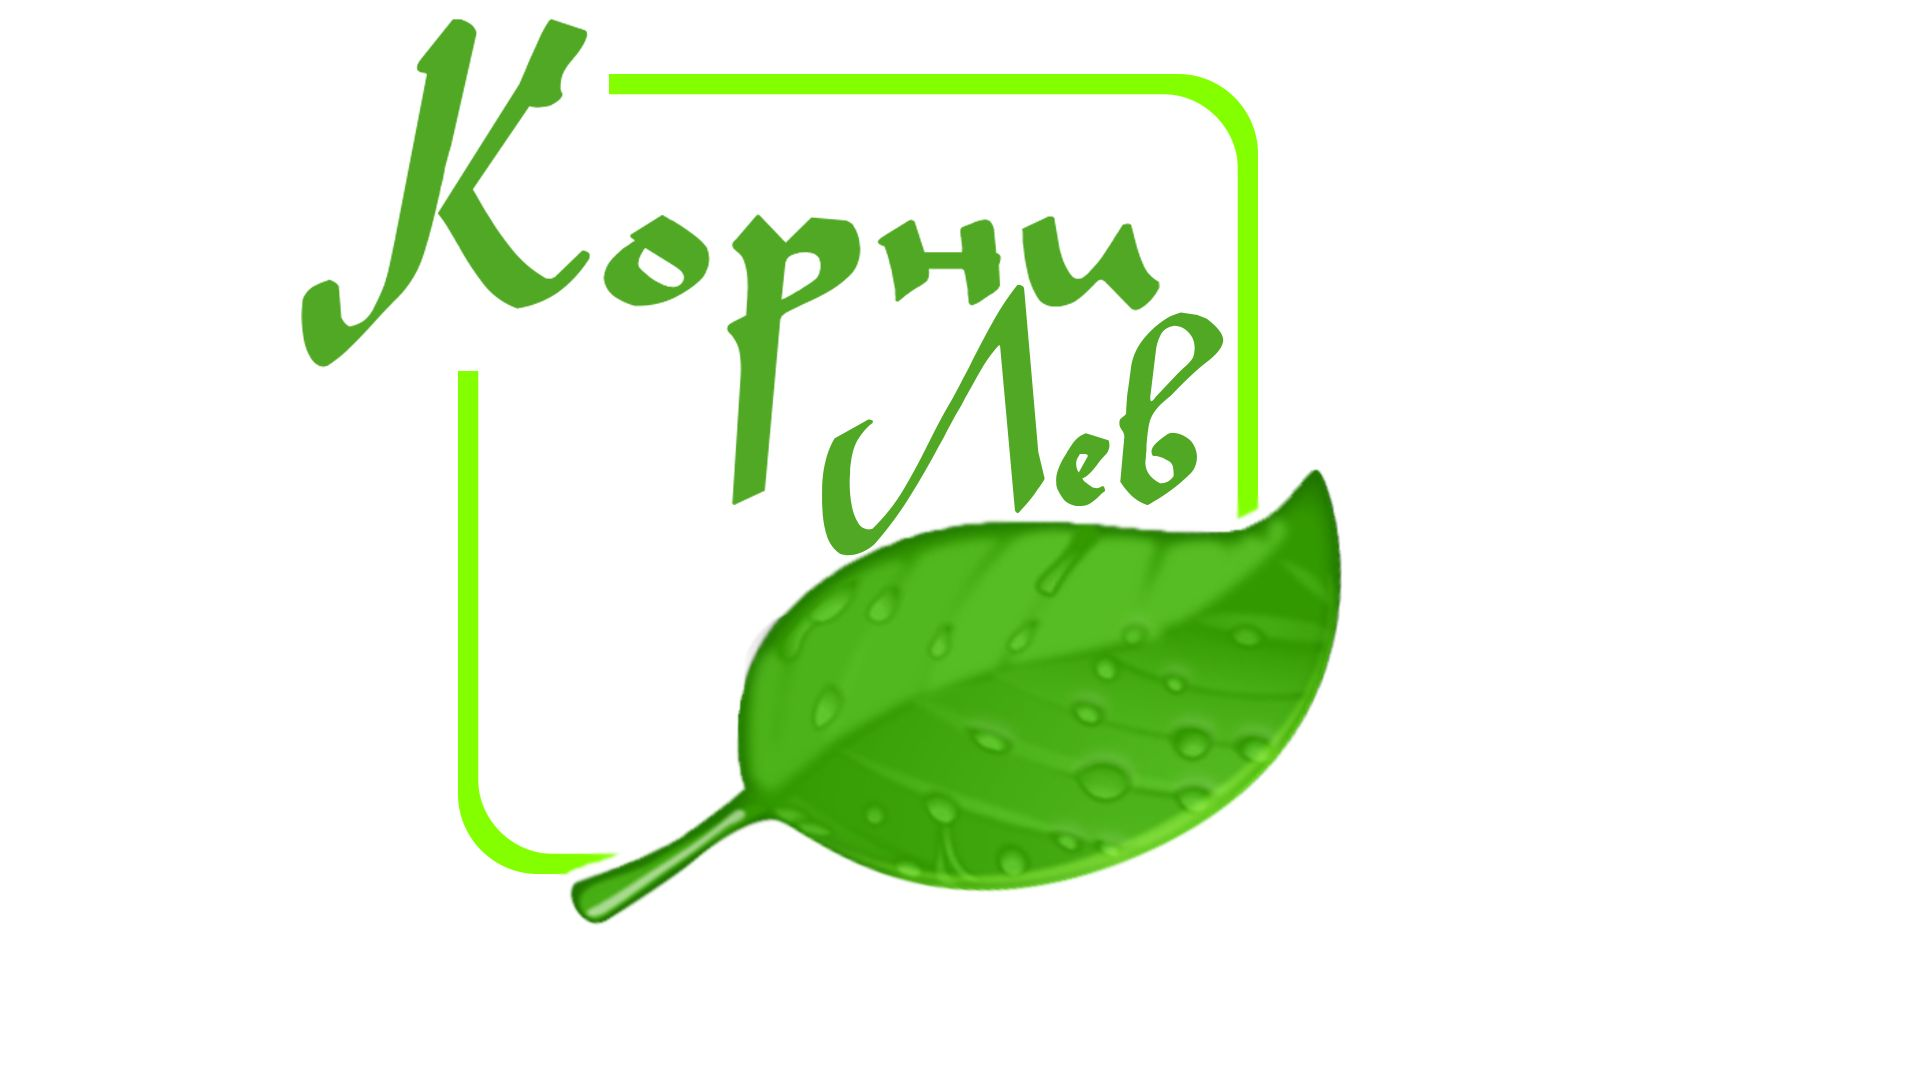 Логотип для компании КорниЛев - дизайнер RayGamesThe